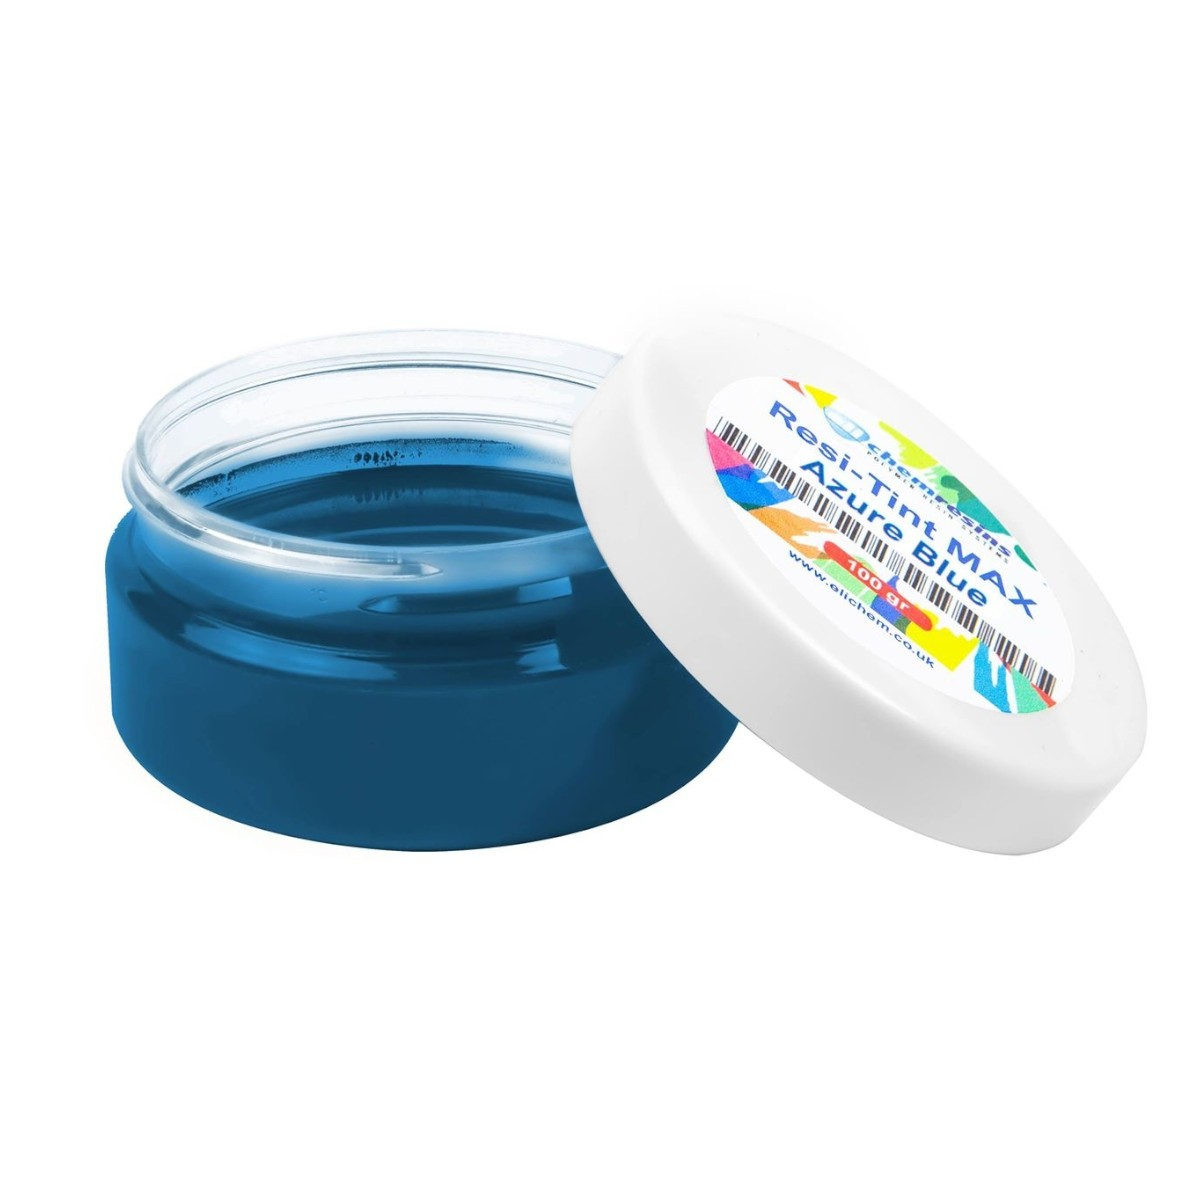 resi- TINT Max, resin farve pigment, 100 gram